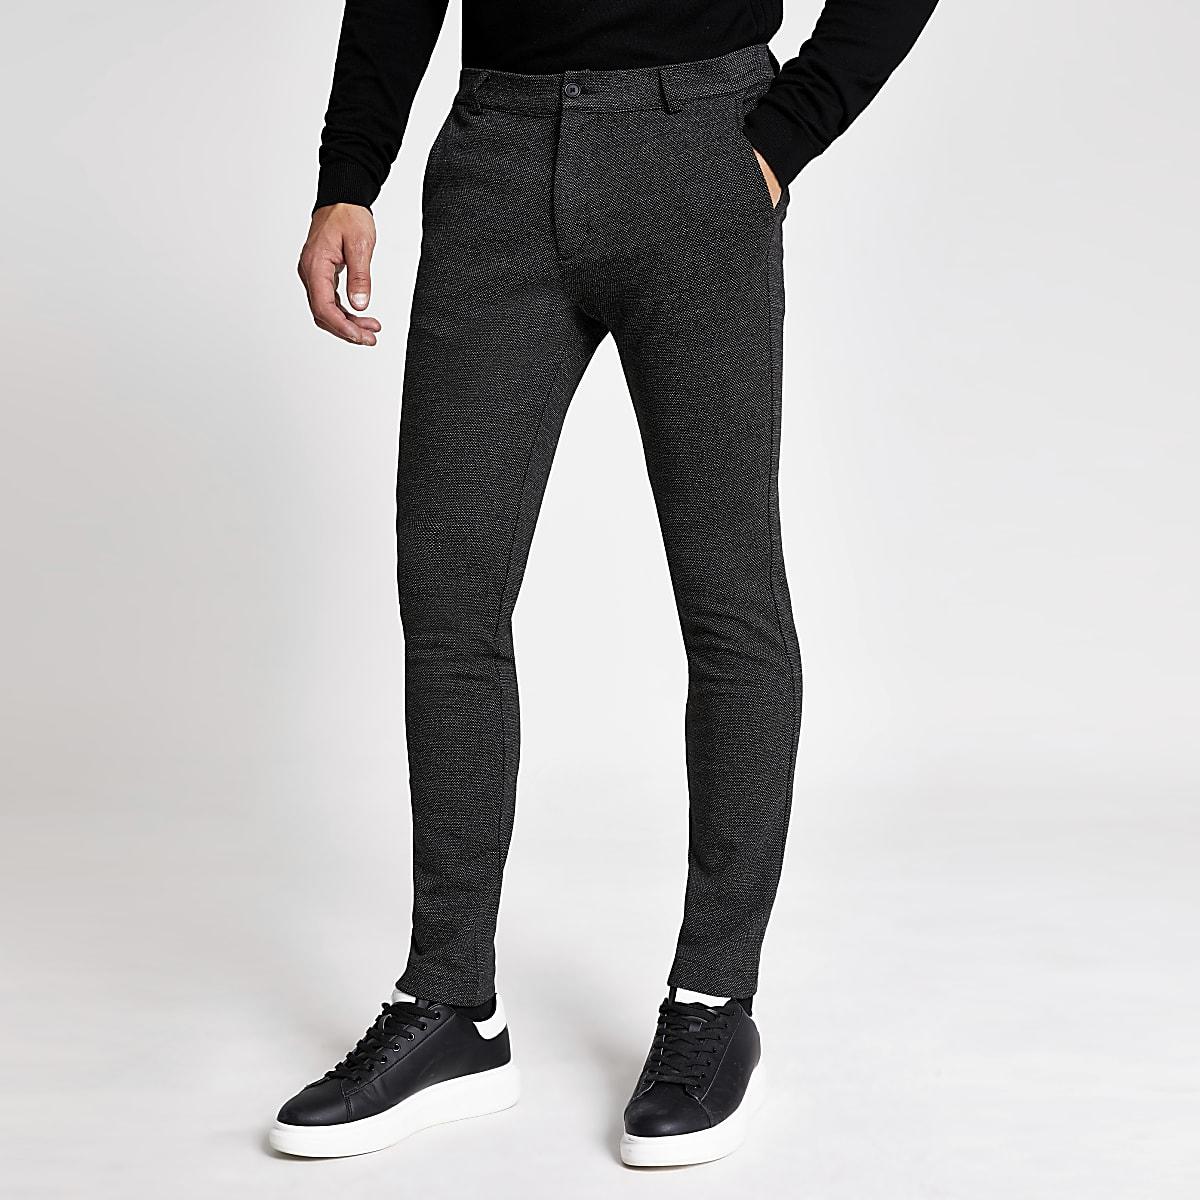 Dark grey textured skinny trousers